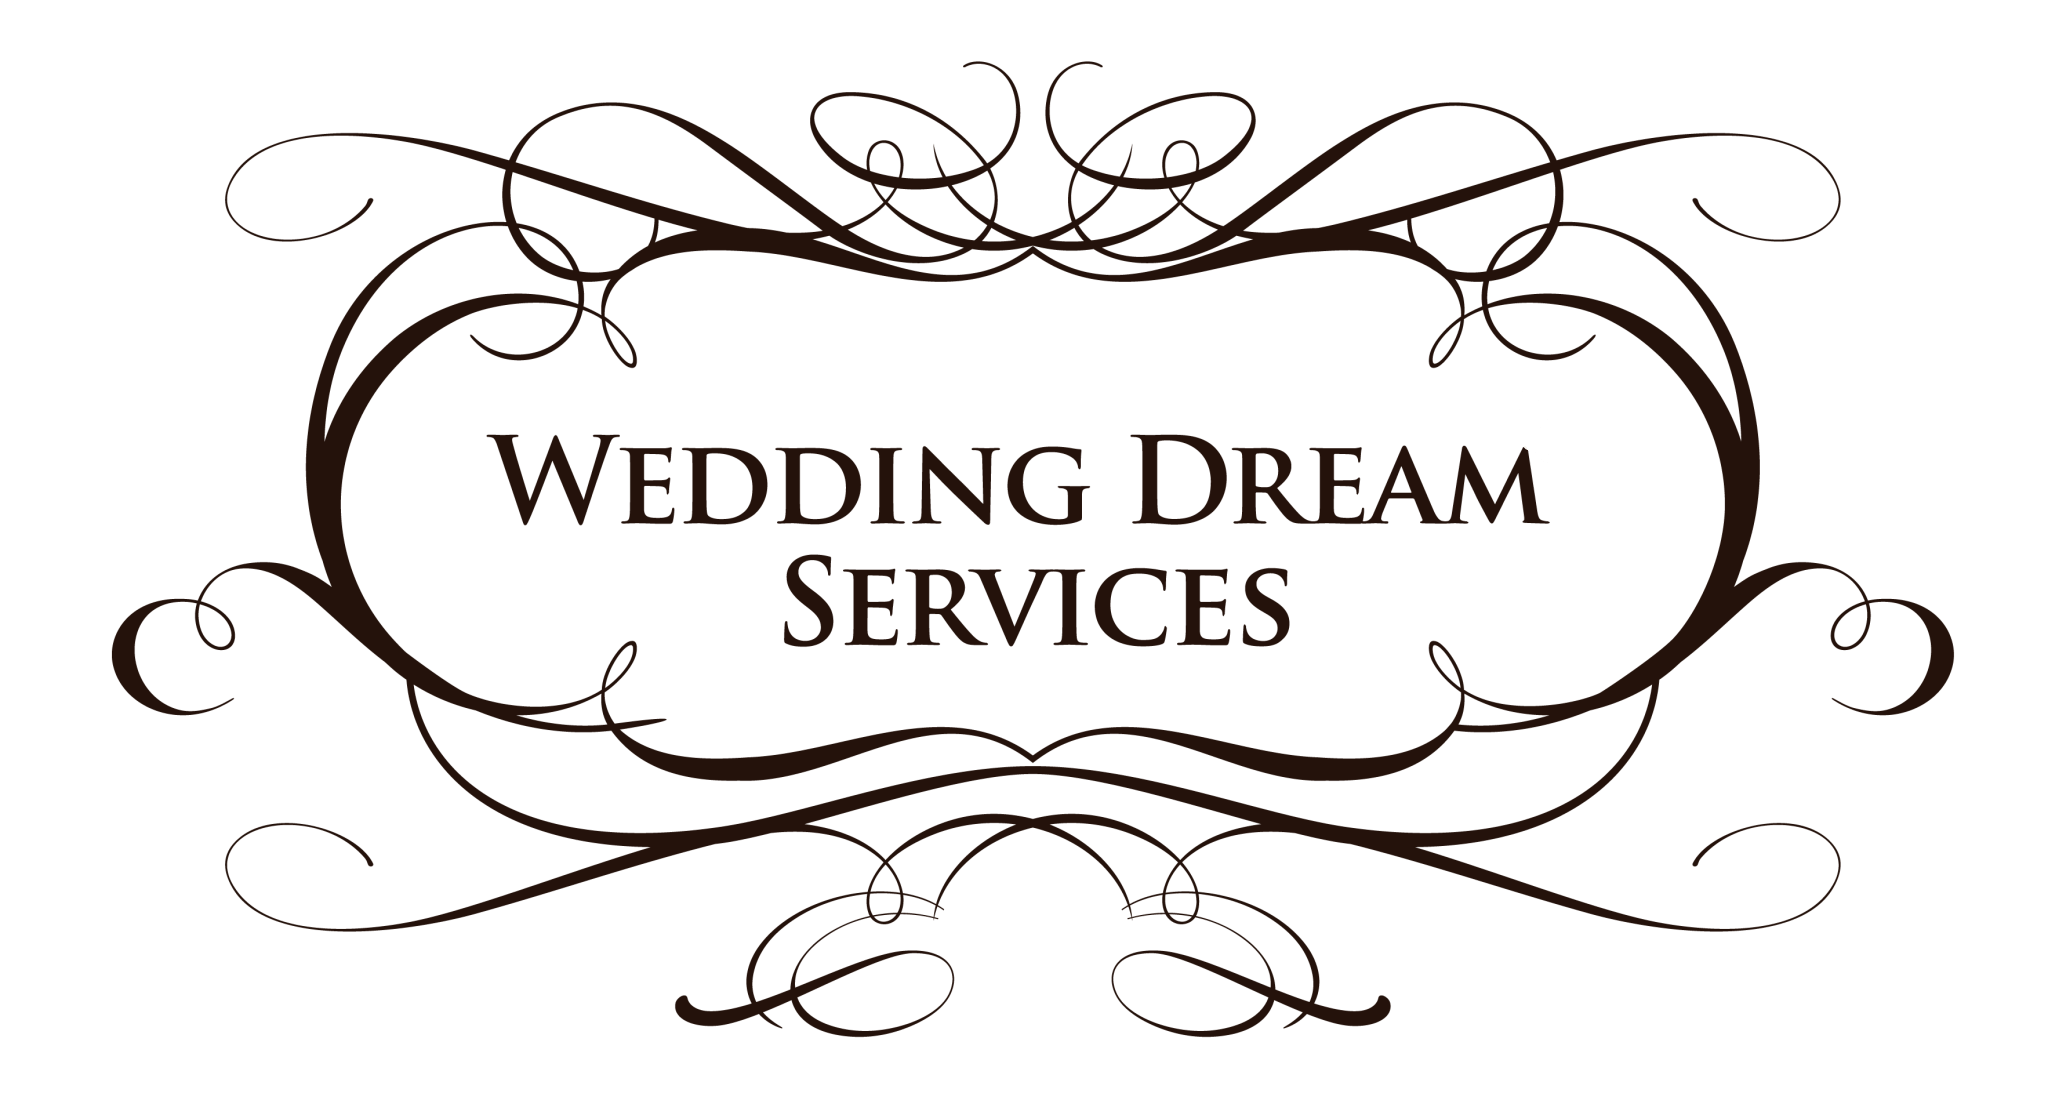 wedding-dream-services